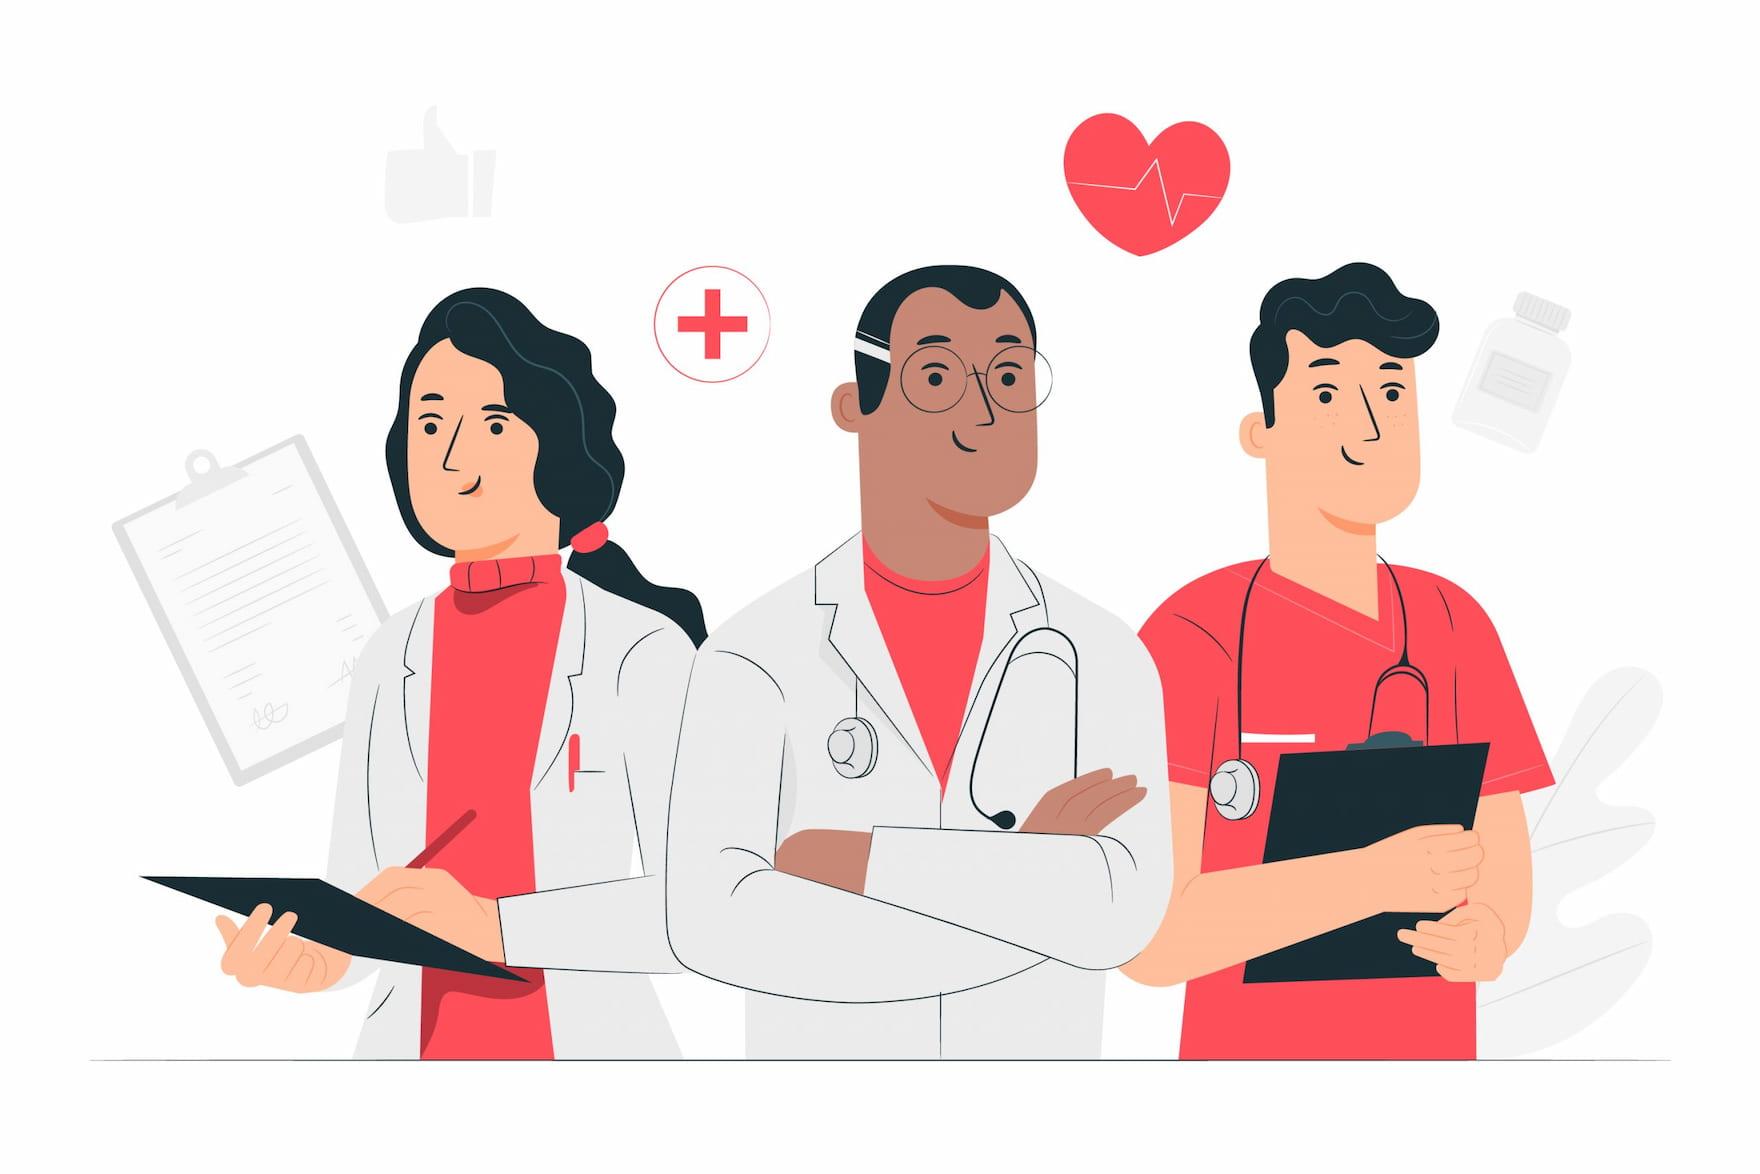 How to make hospital management software